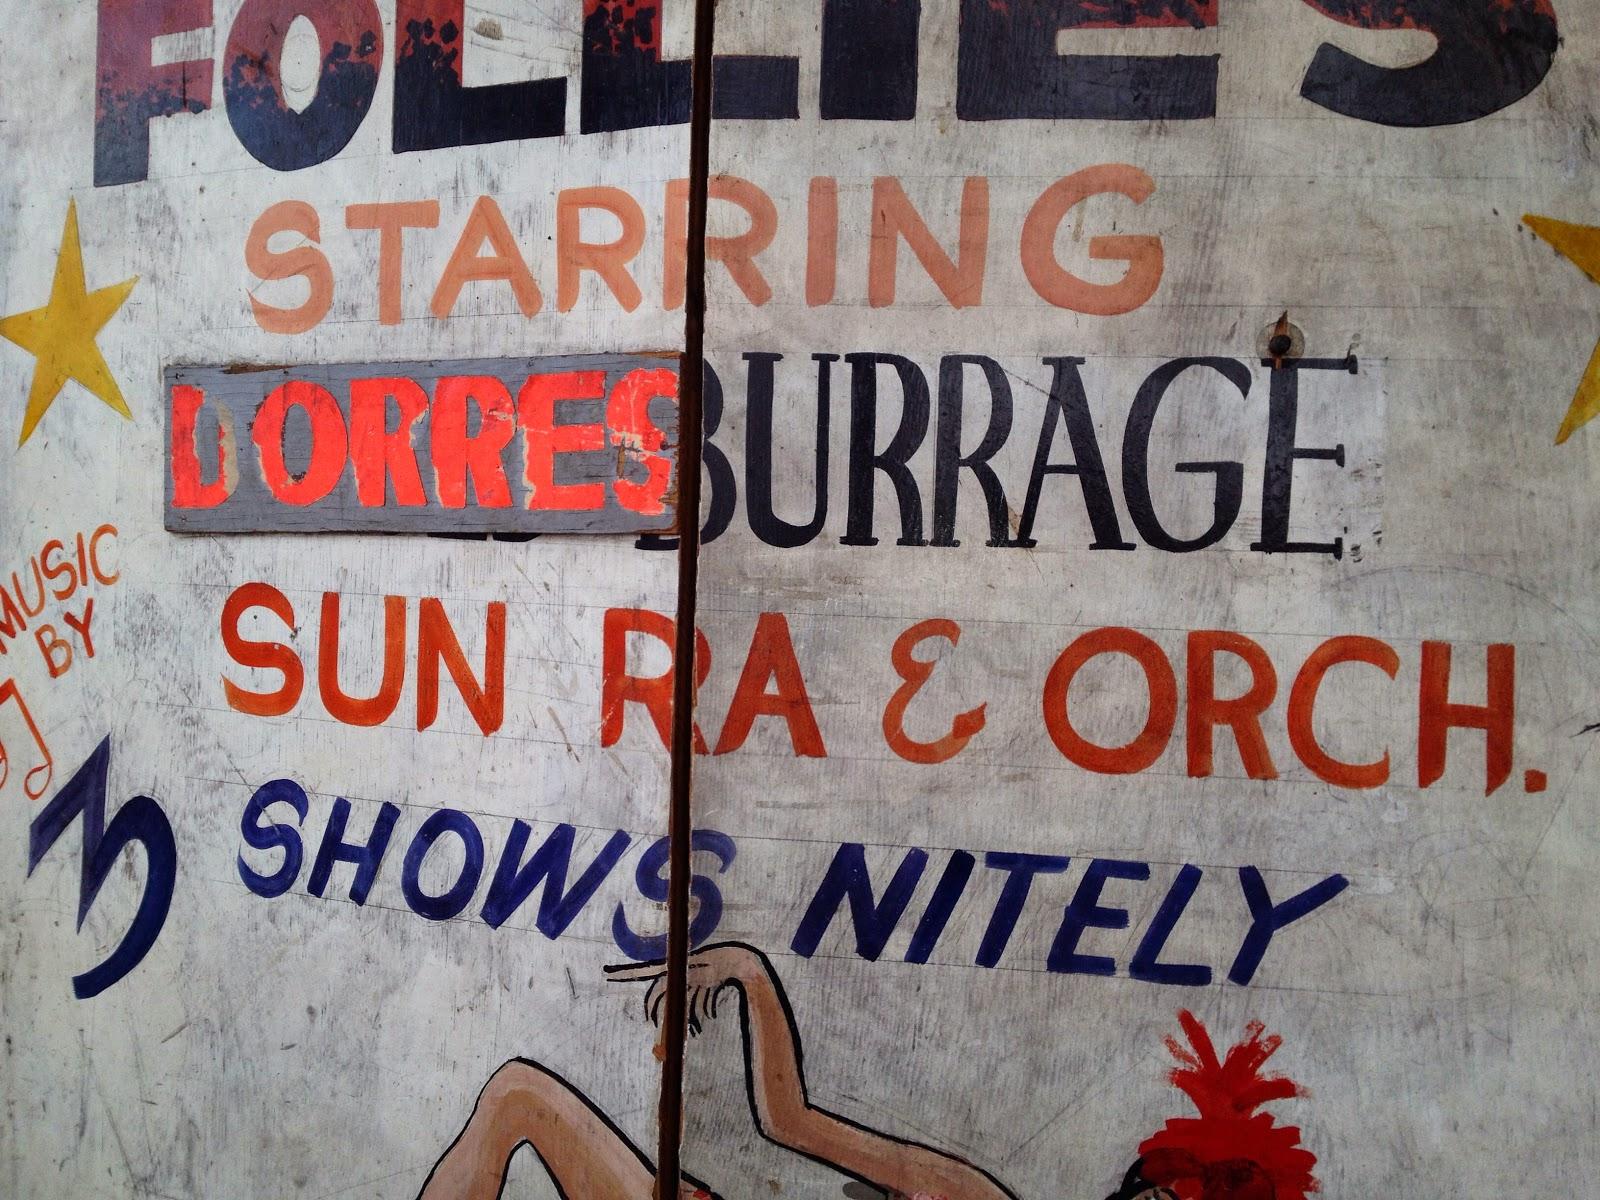 Follies Starring Lorres Burrage, SUN RA & Orch. 3 Shows Nitely